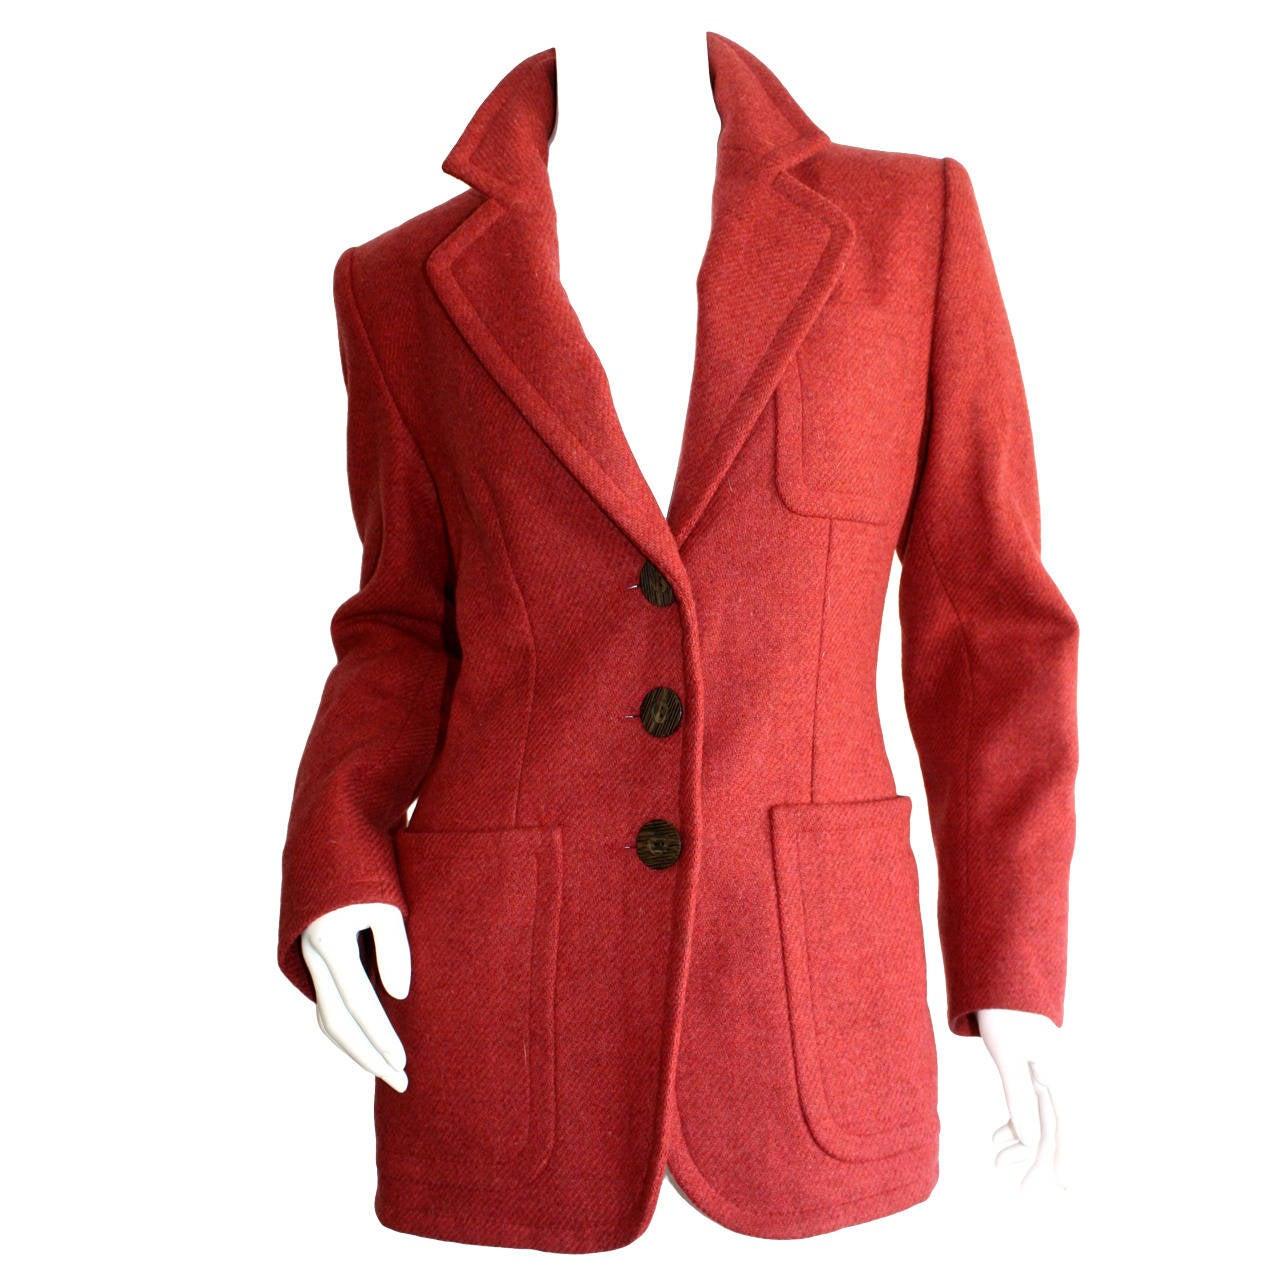 "Superb Vintage Yves Saint Laurent "" Rive Gauche "" Raspberry Pink Blazer"